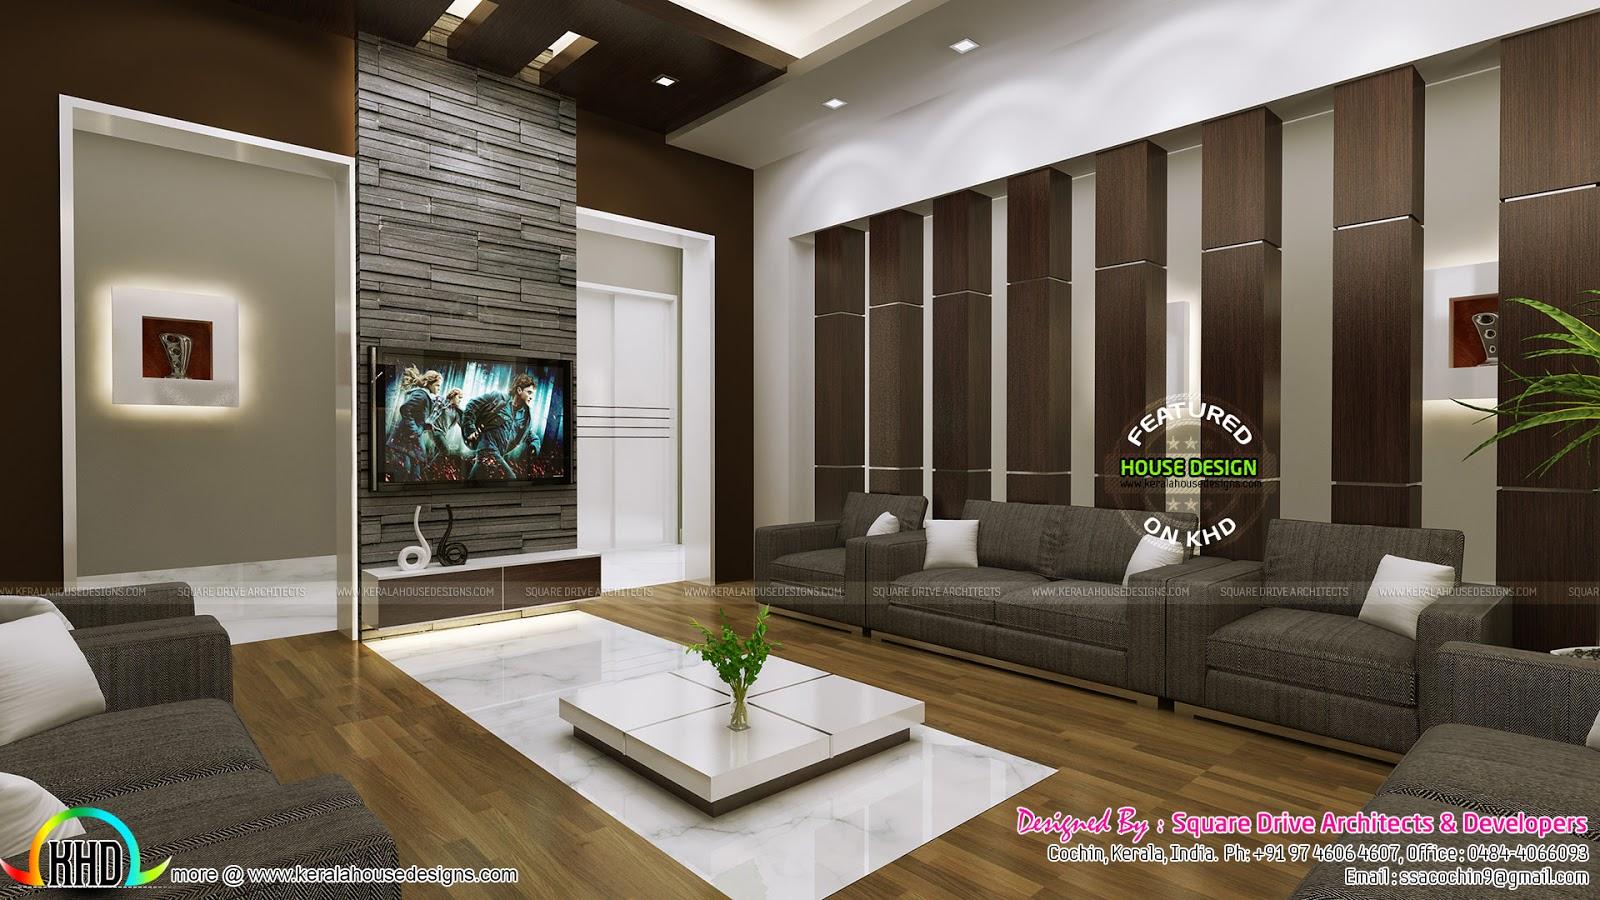 Very beautiful modern interior designs - Kerala home ...